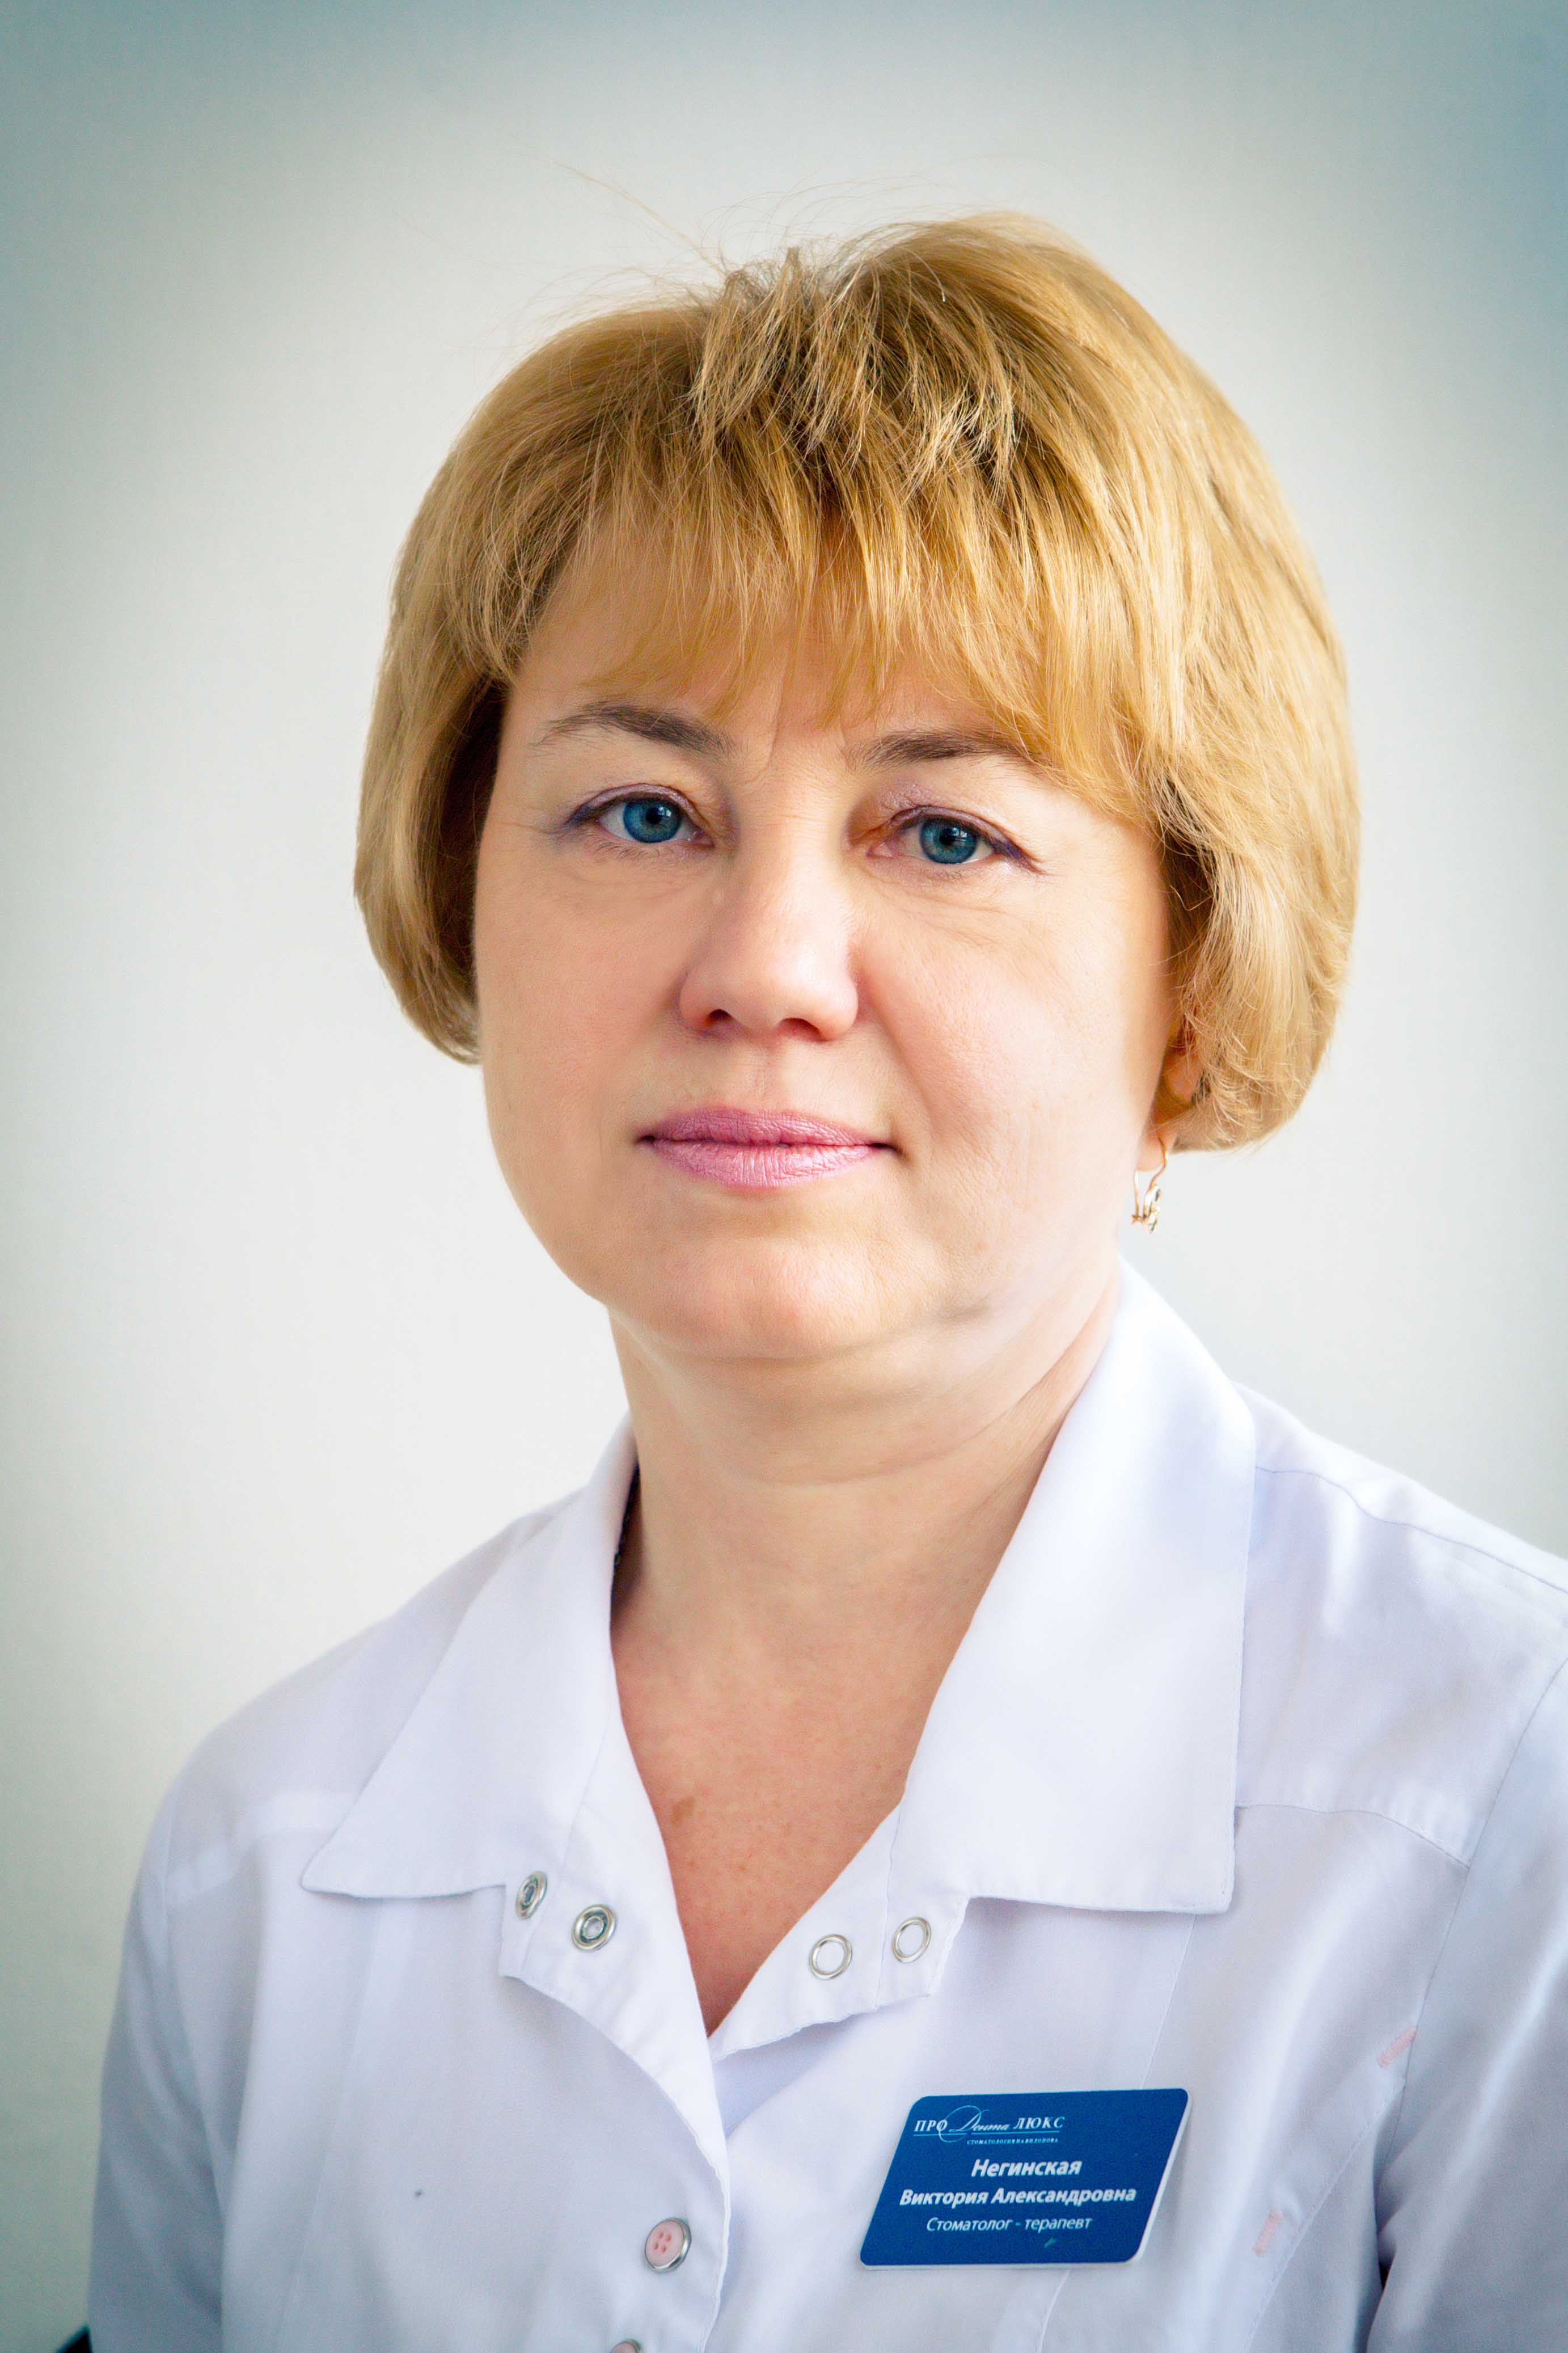 Запись к врачу по интернету владивосток поликлиника 4